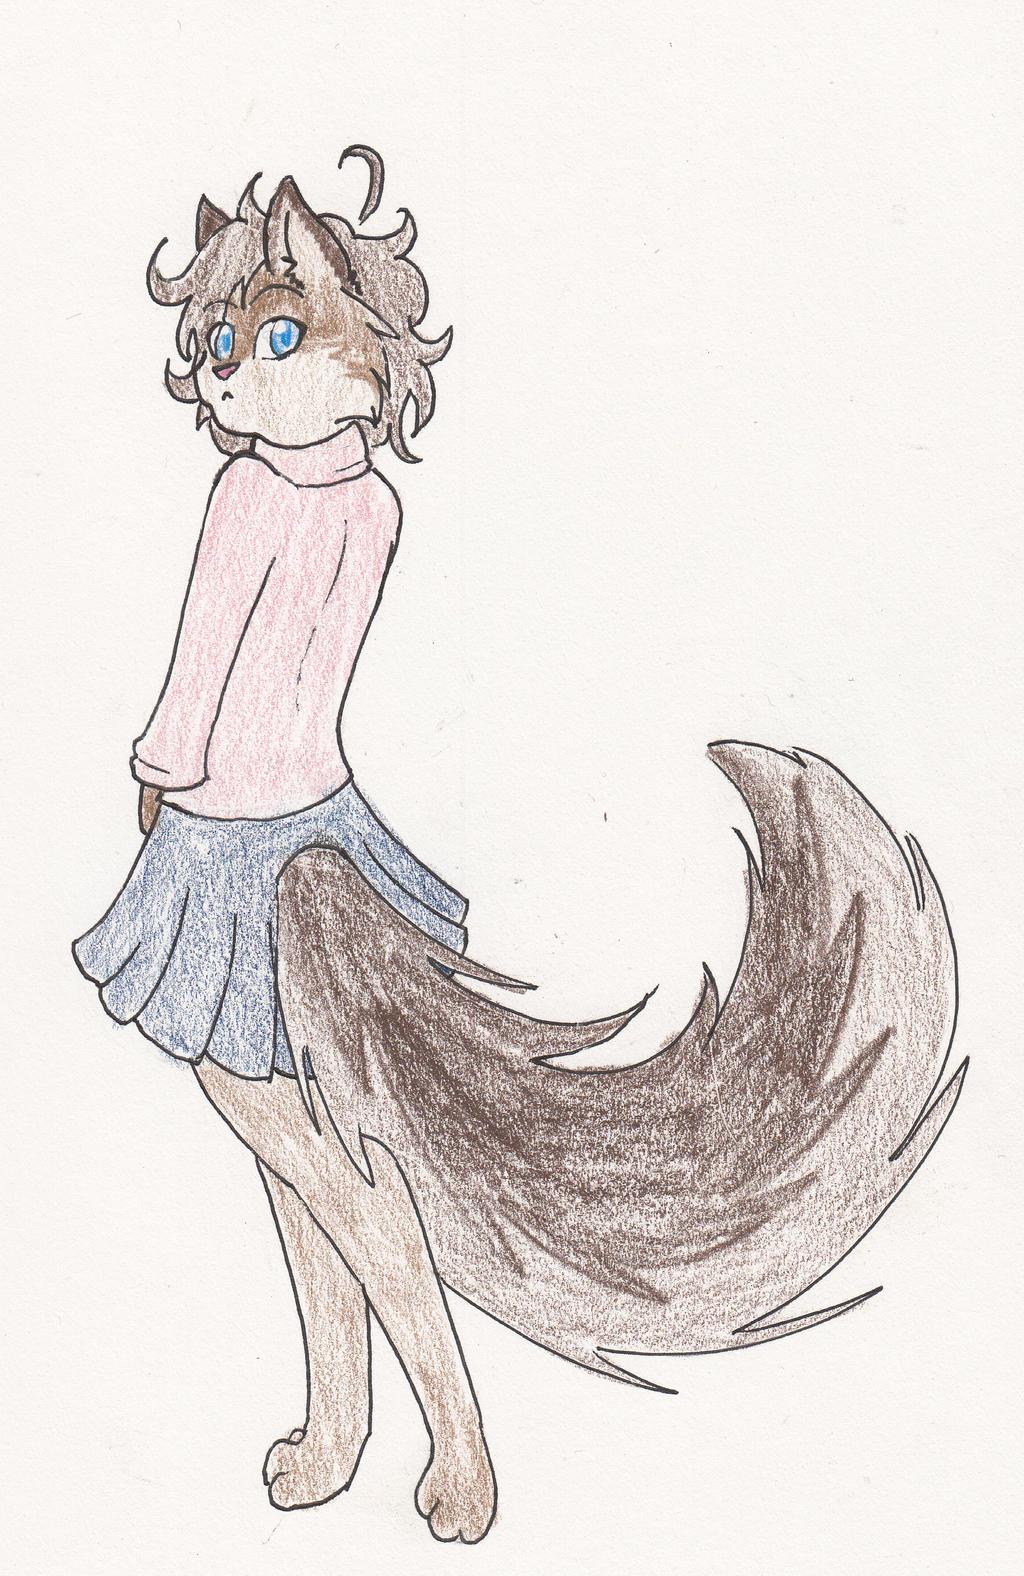 Miniskirt Kitty by moonlightartistry